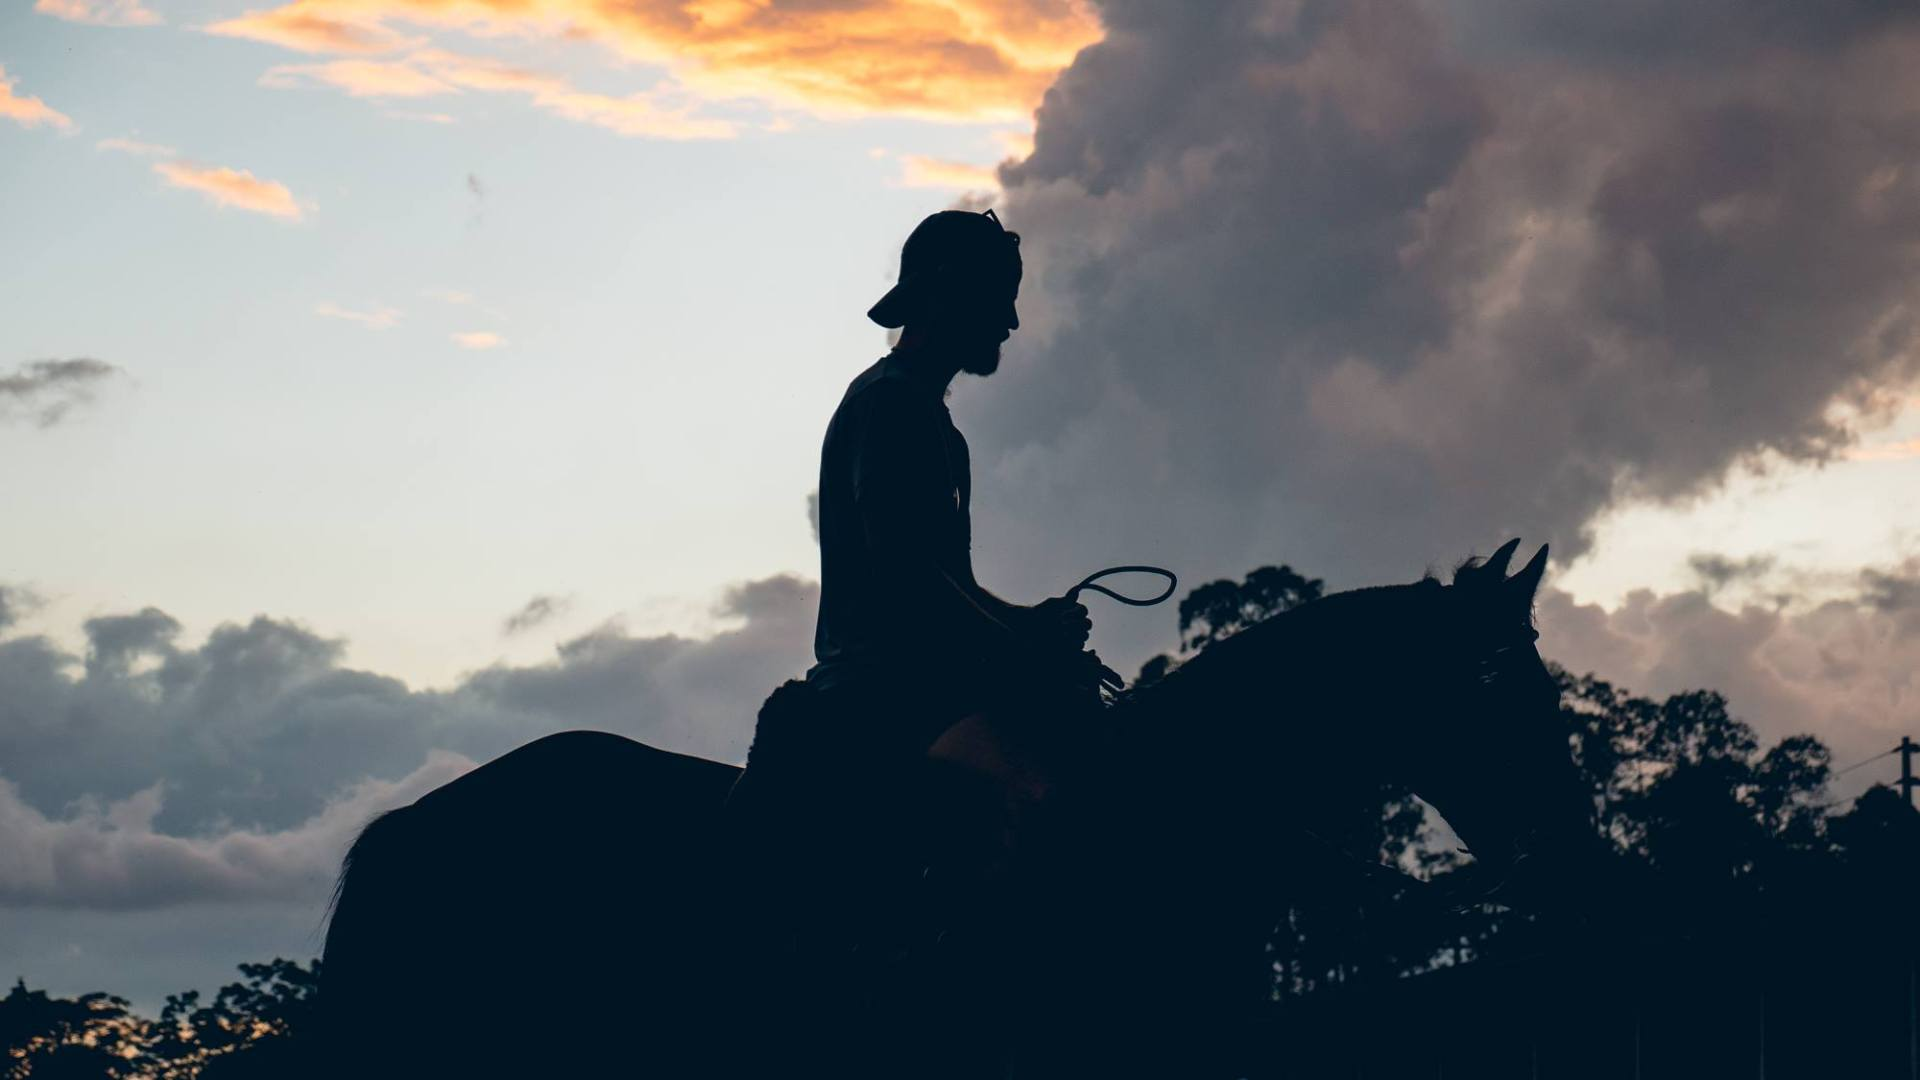 Martin à cheval